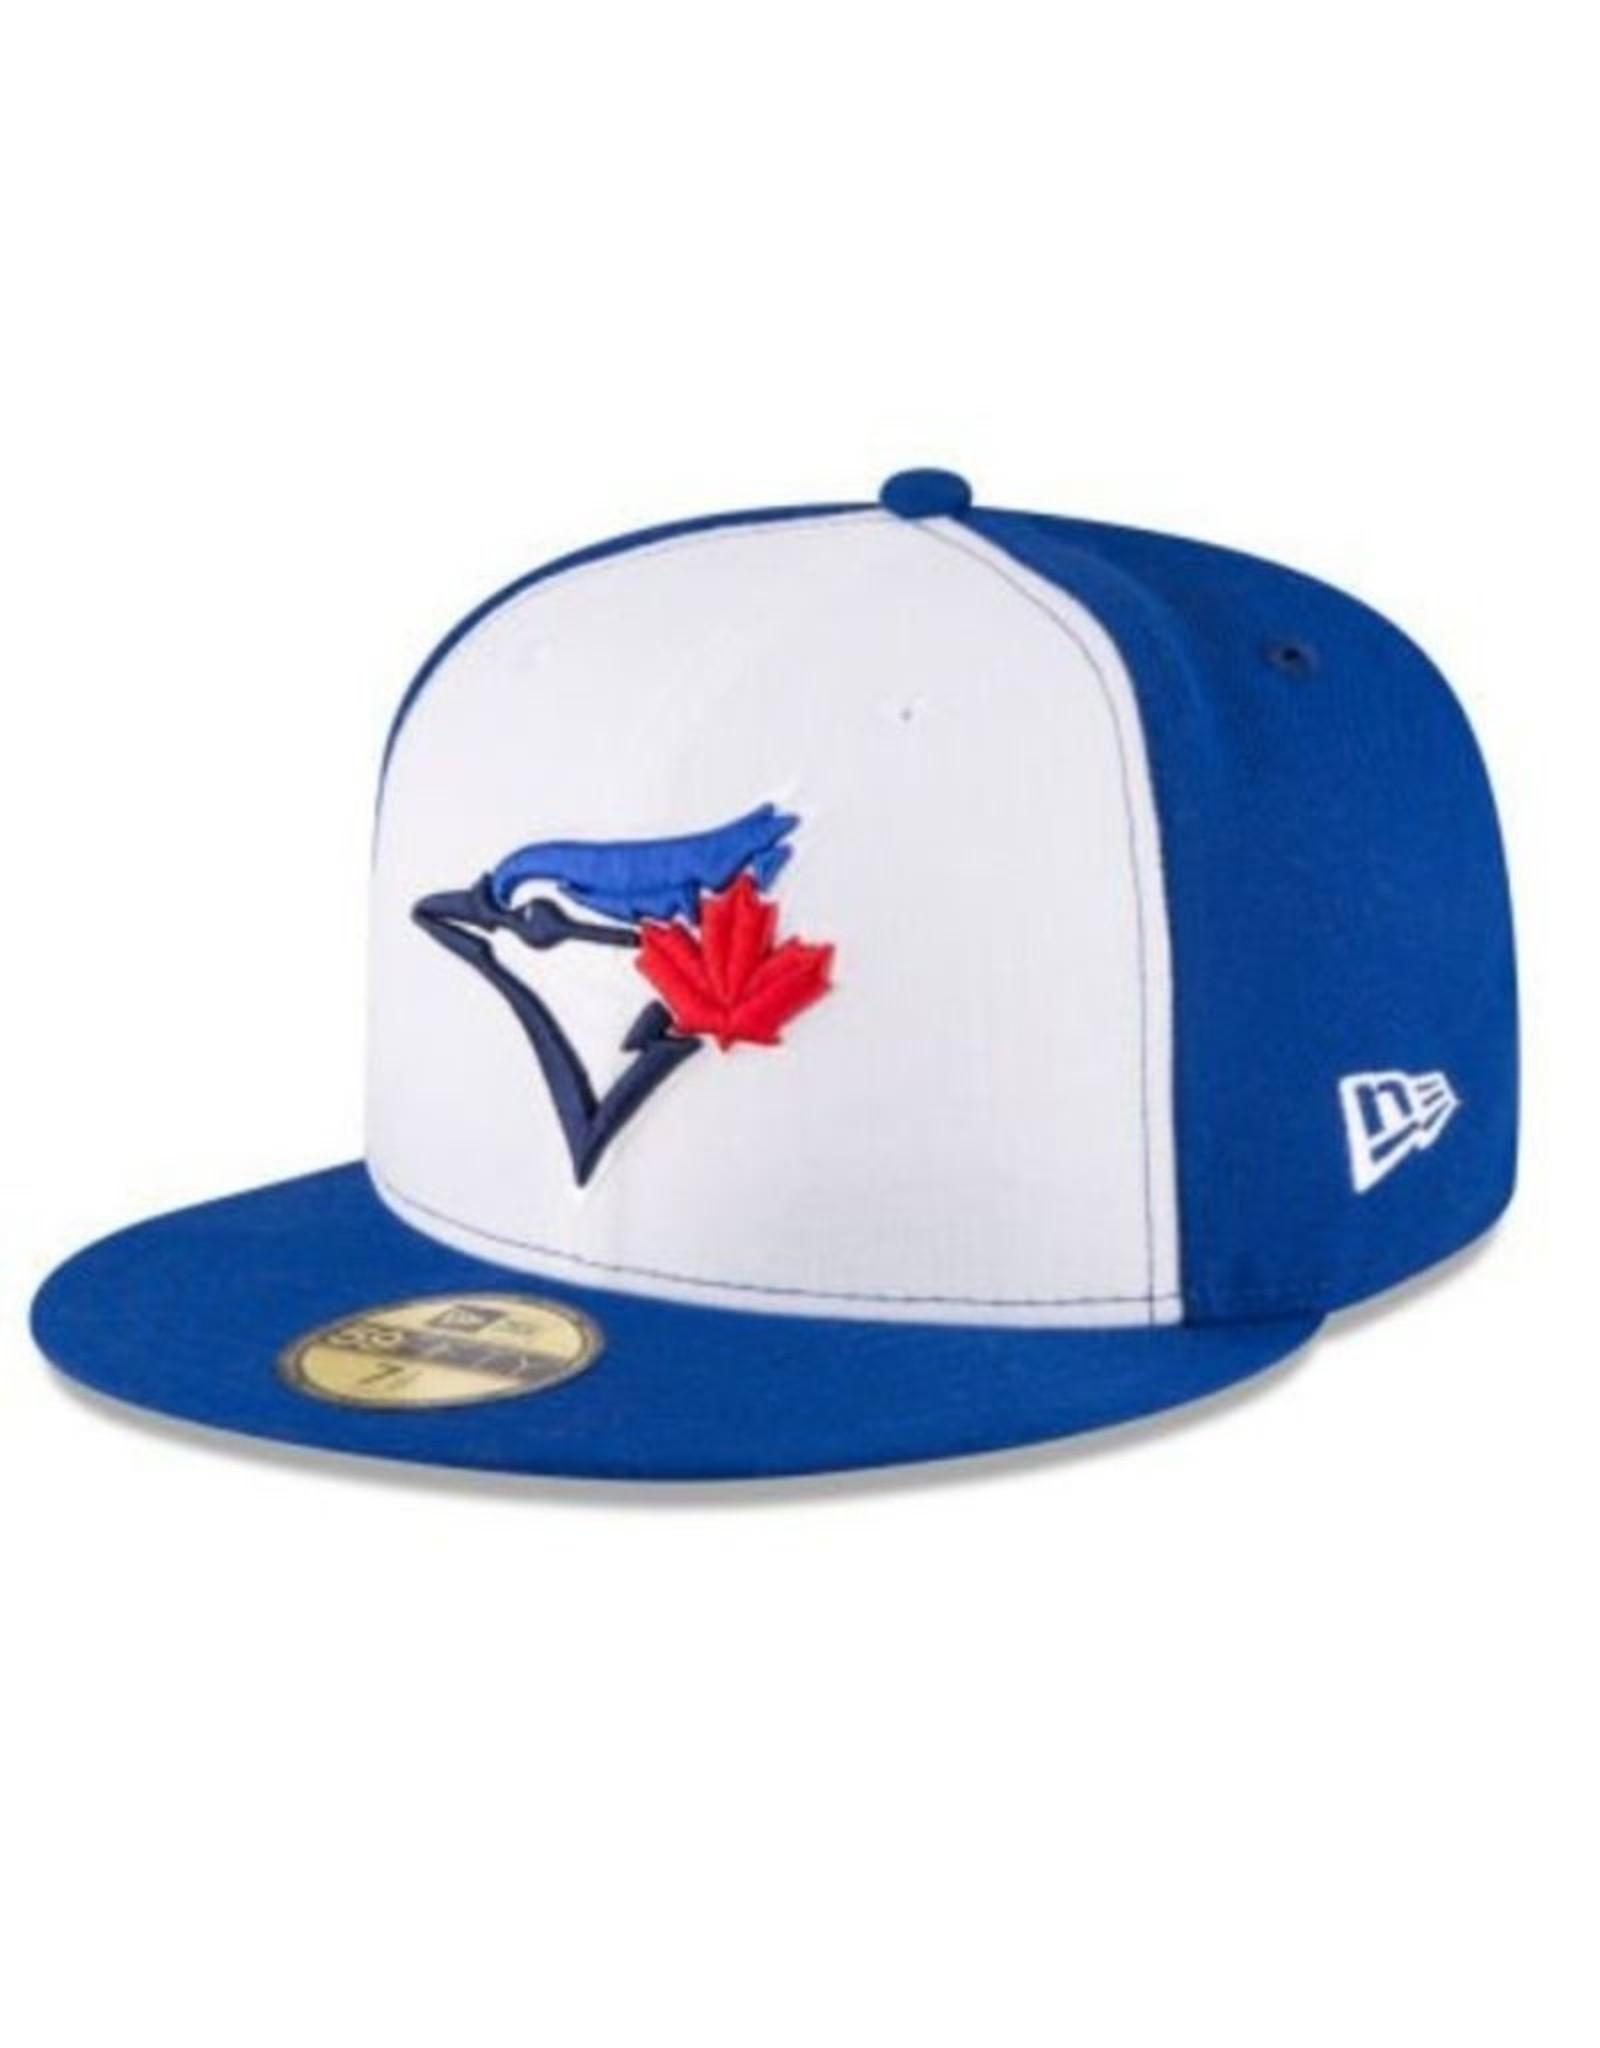 New Era On-Field Authentic 59FIFTY Alternate 3 Hat Toronto Blue Jays